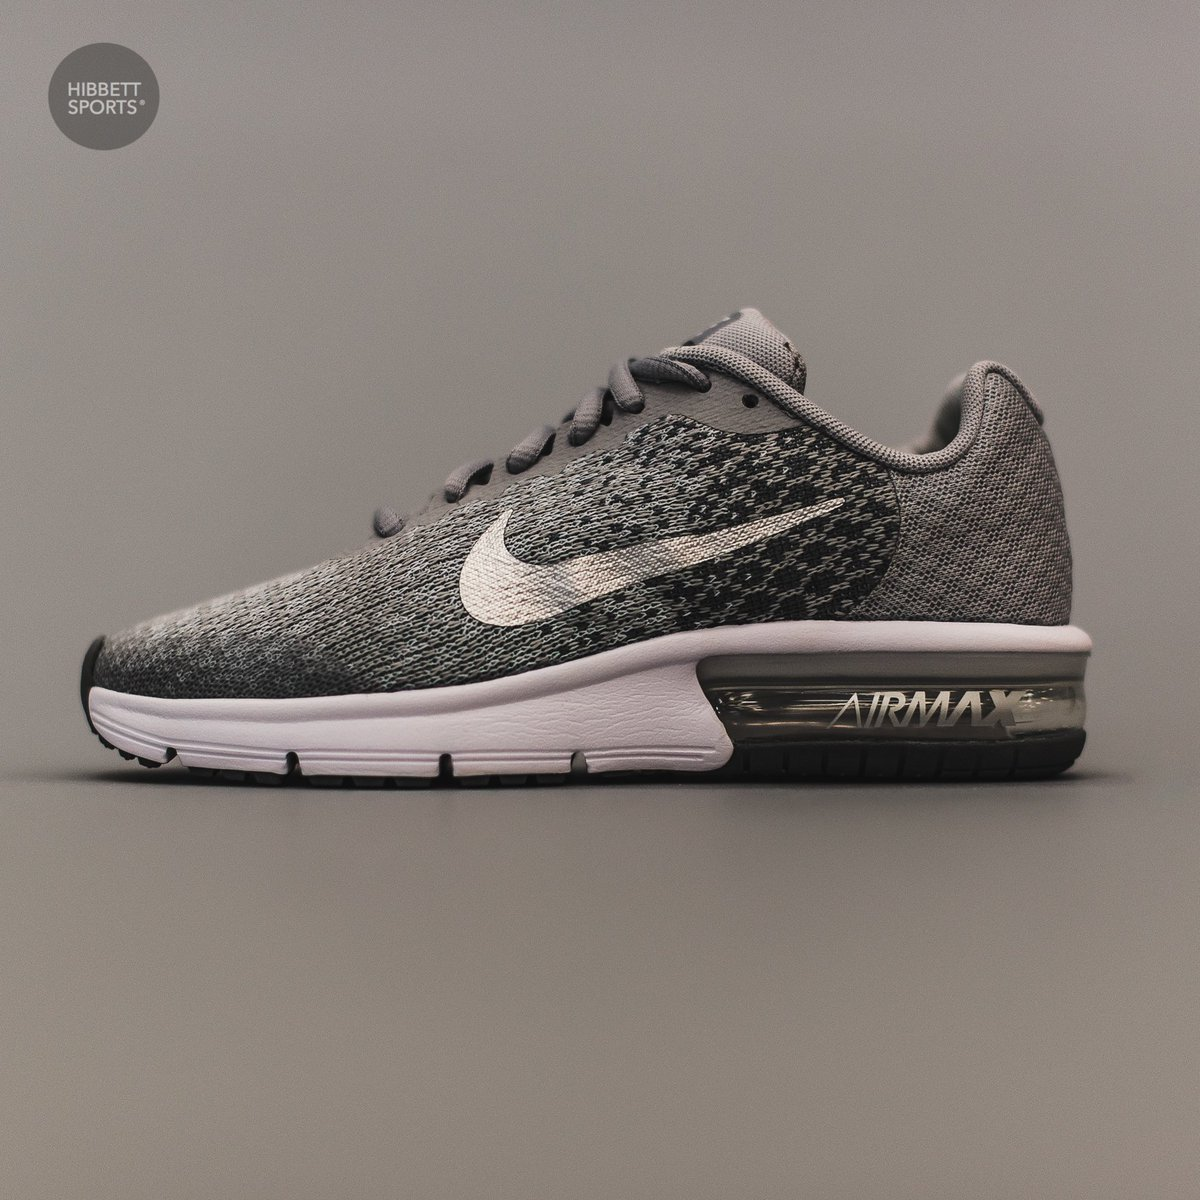 Nike Springblade Sports Shoes